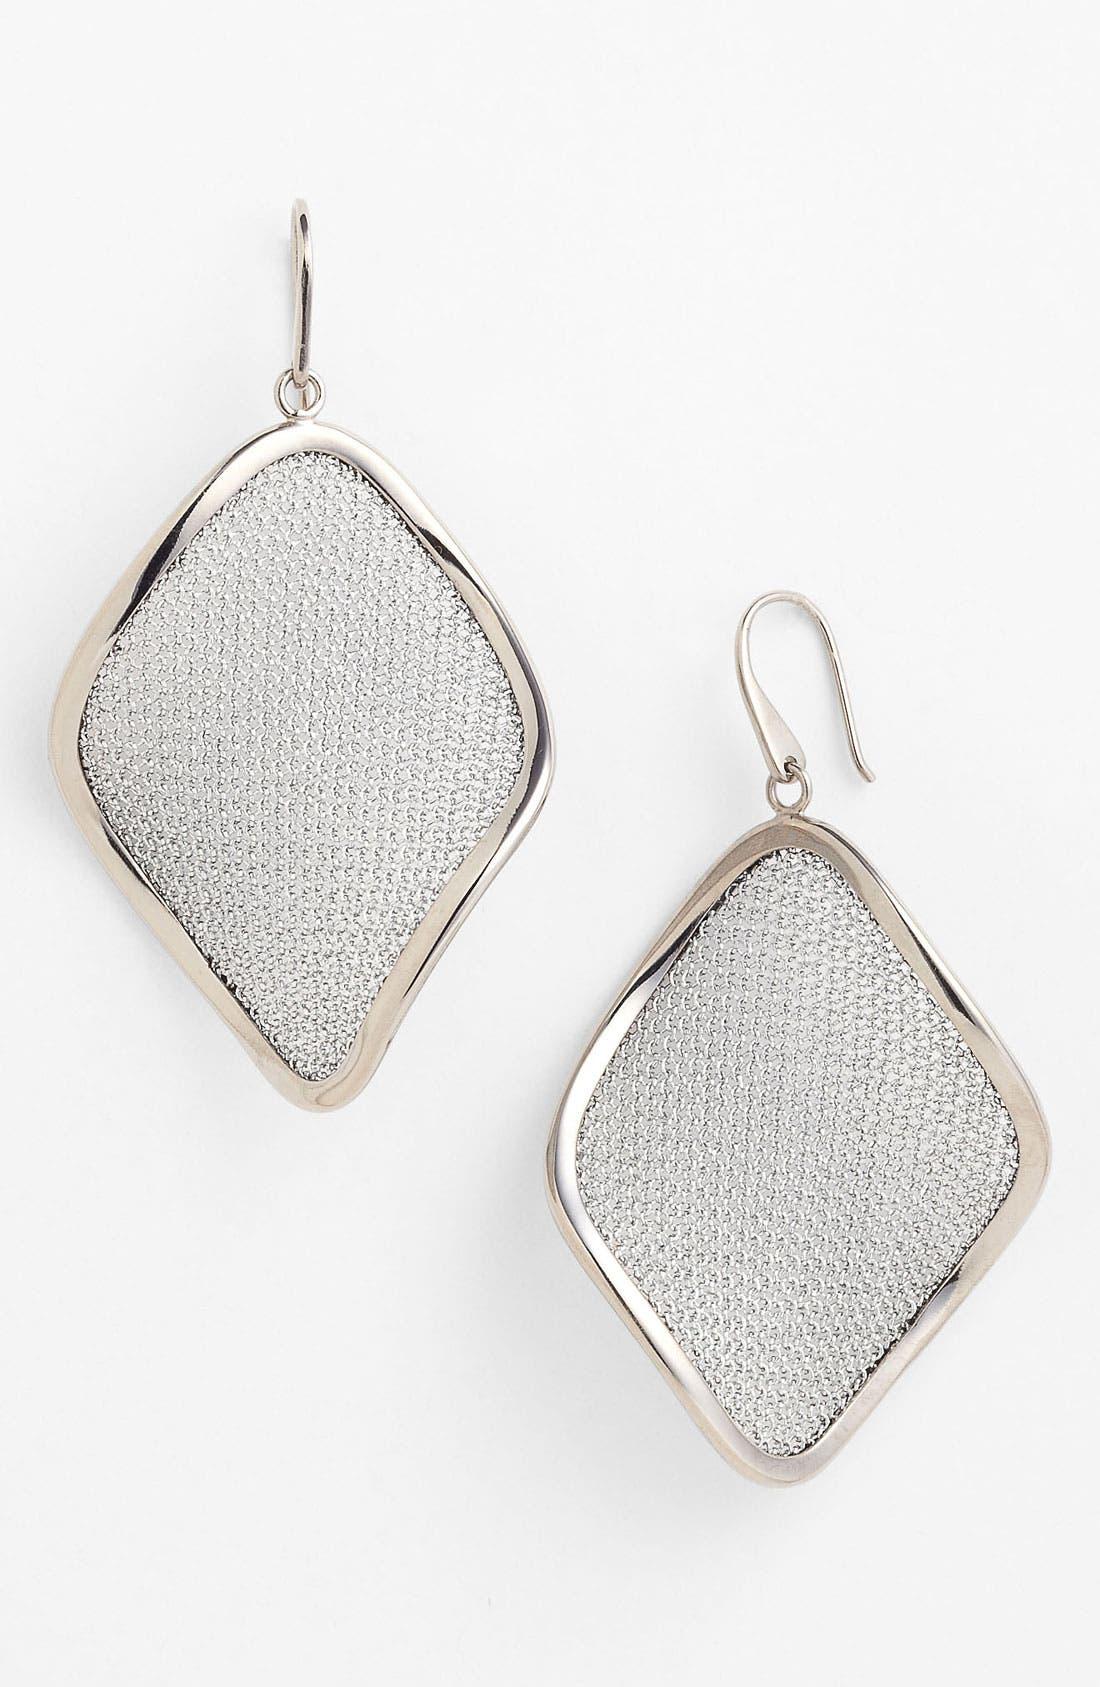 Main Image - Adami & Martucci 'Mesh' Large Drop Earrings